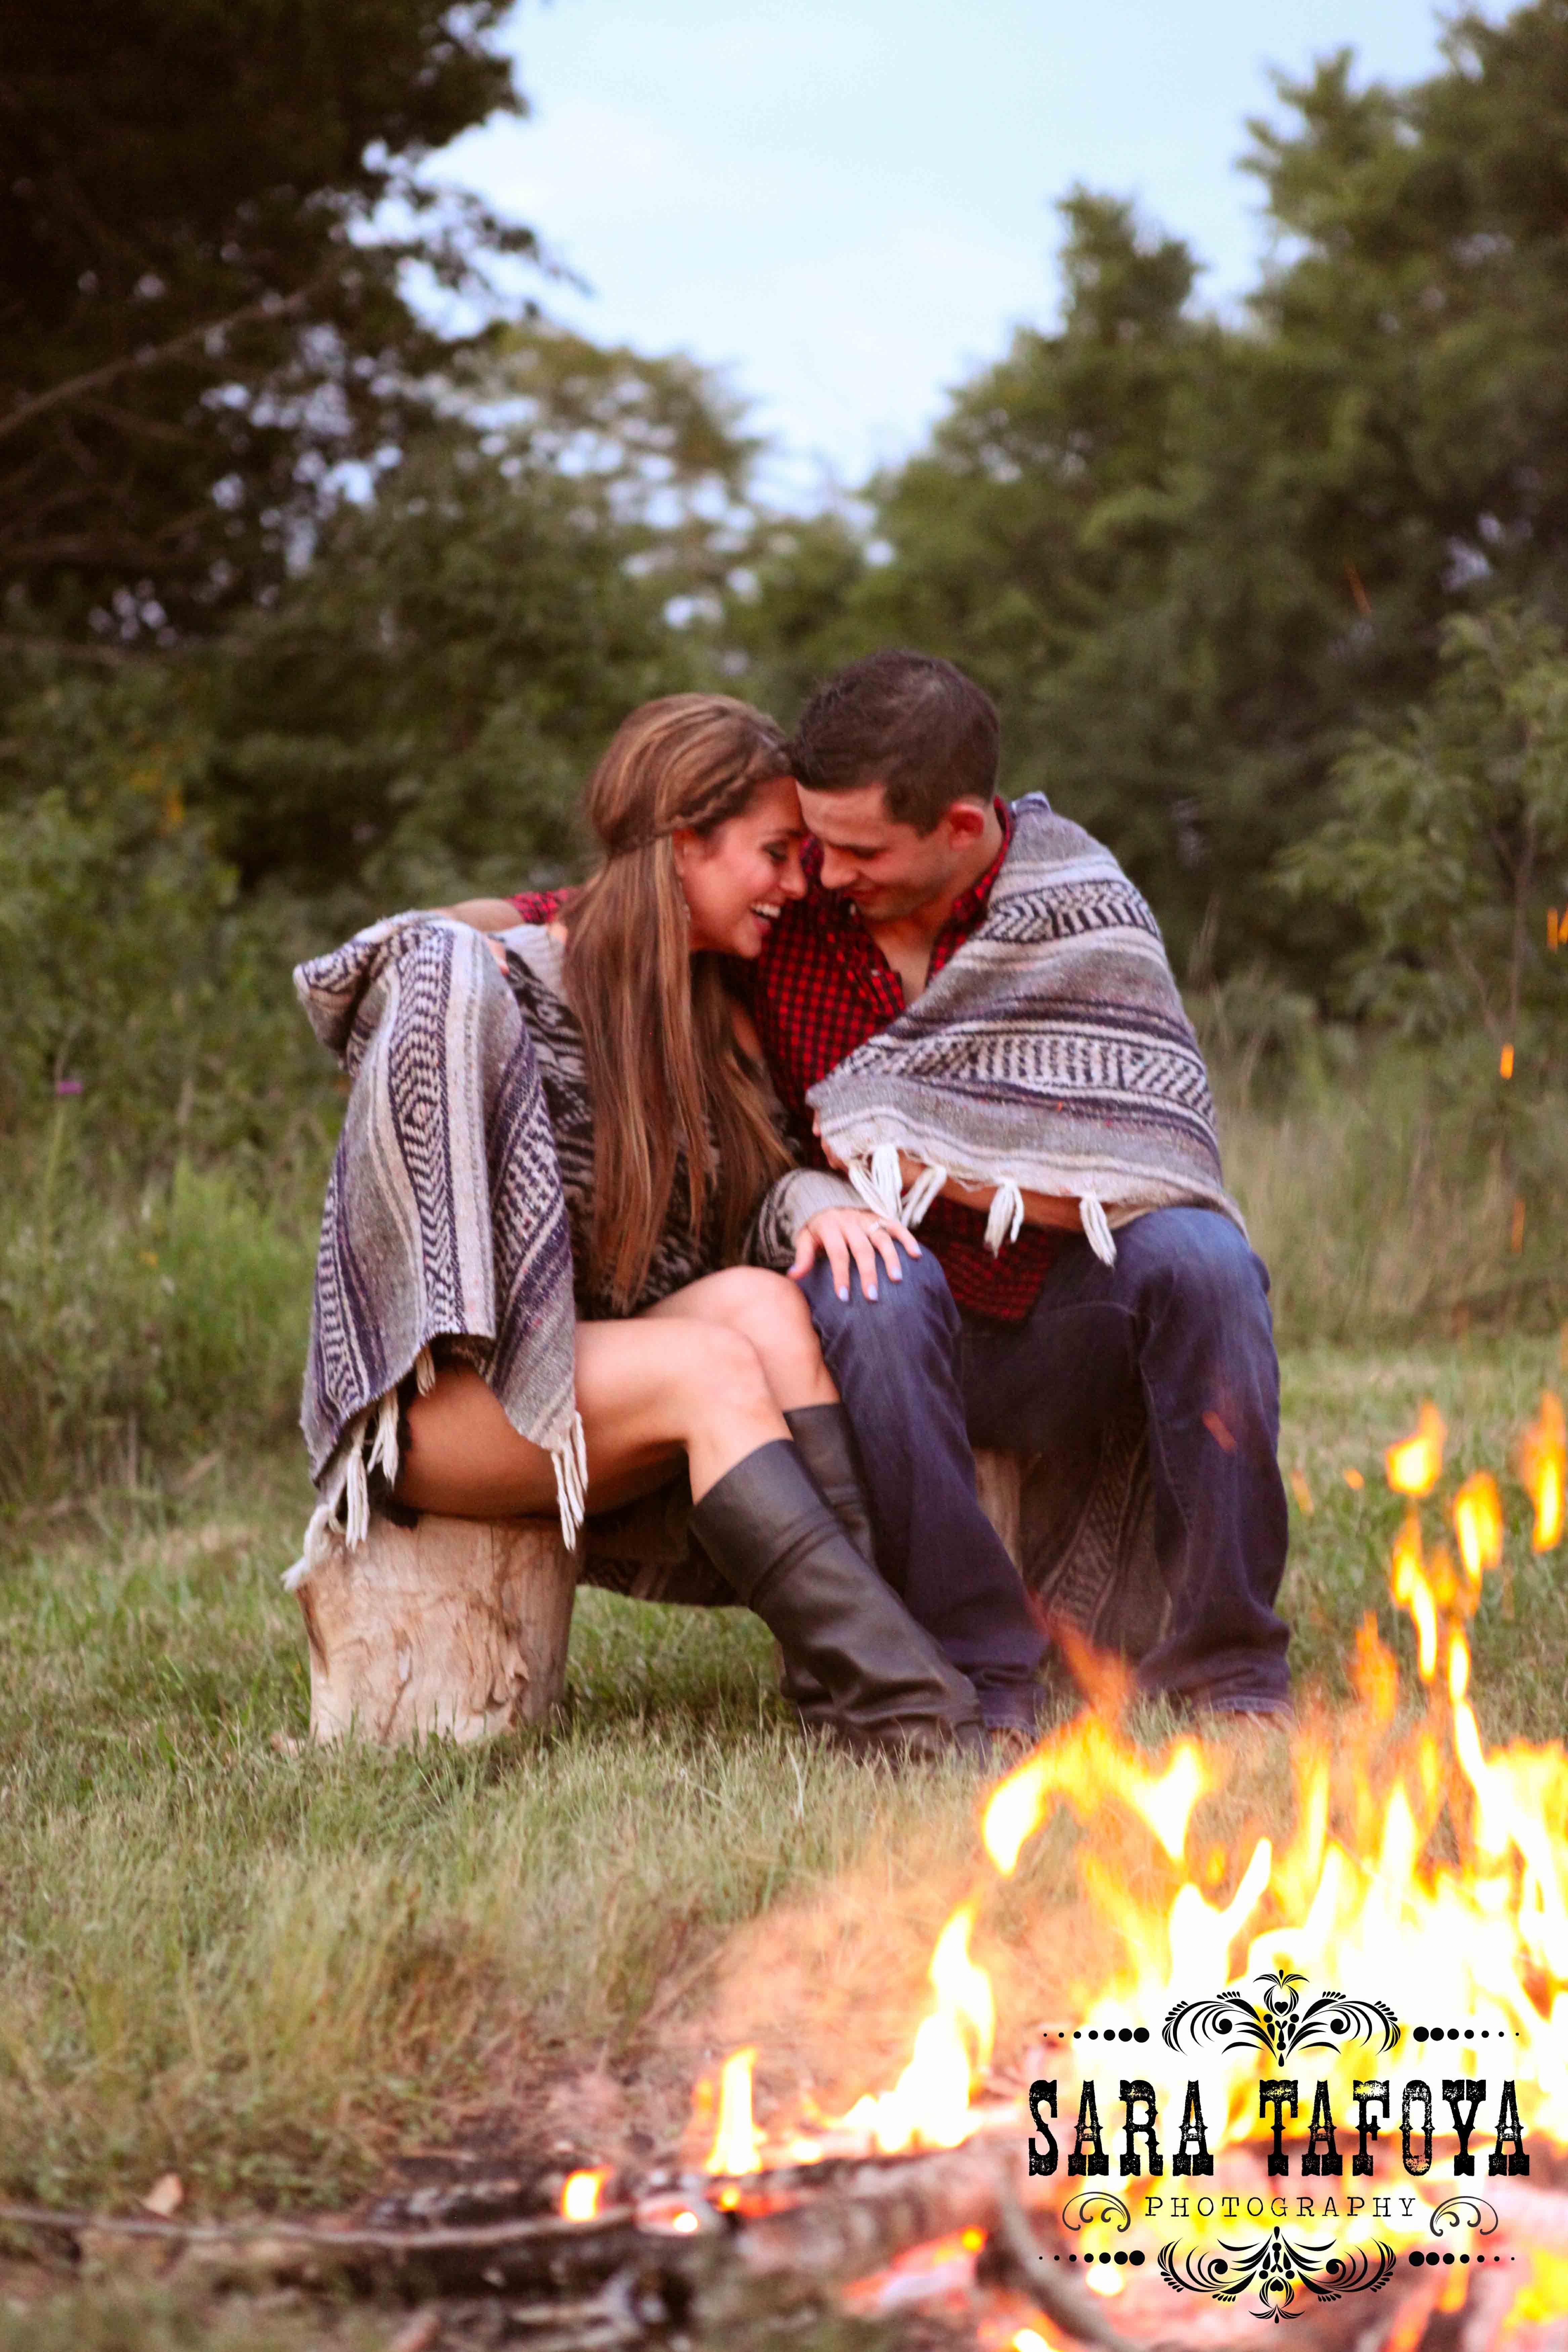 Sedalia dating Datierung in Kanada-Regeln